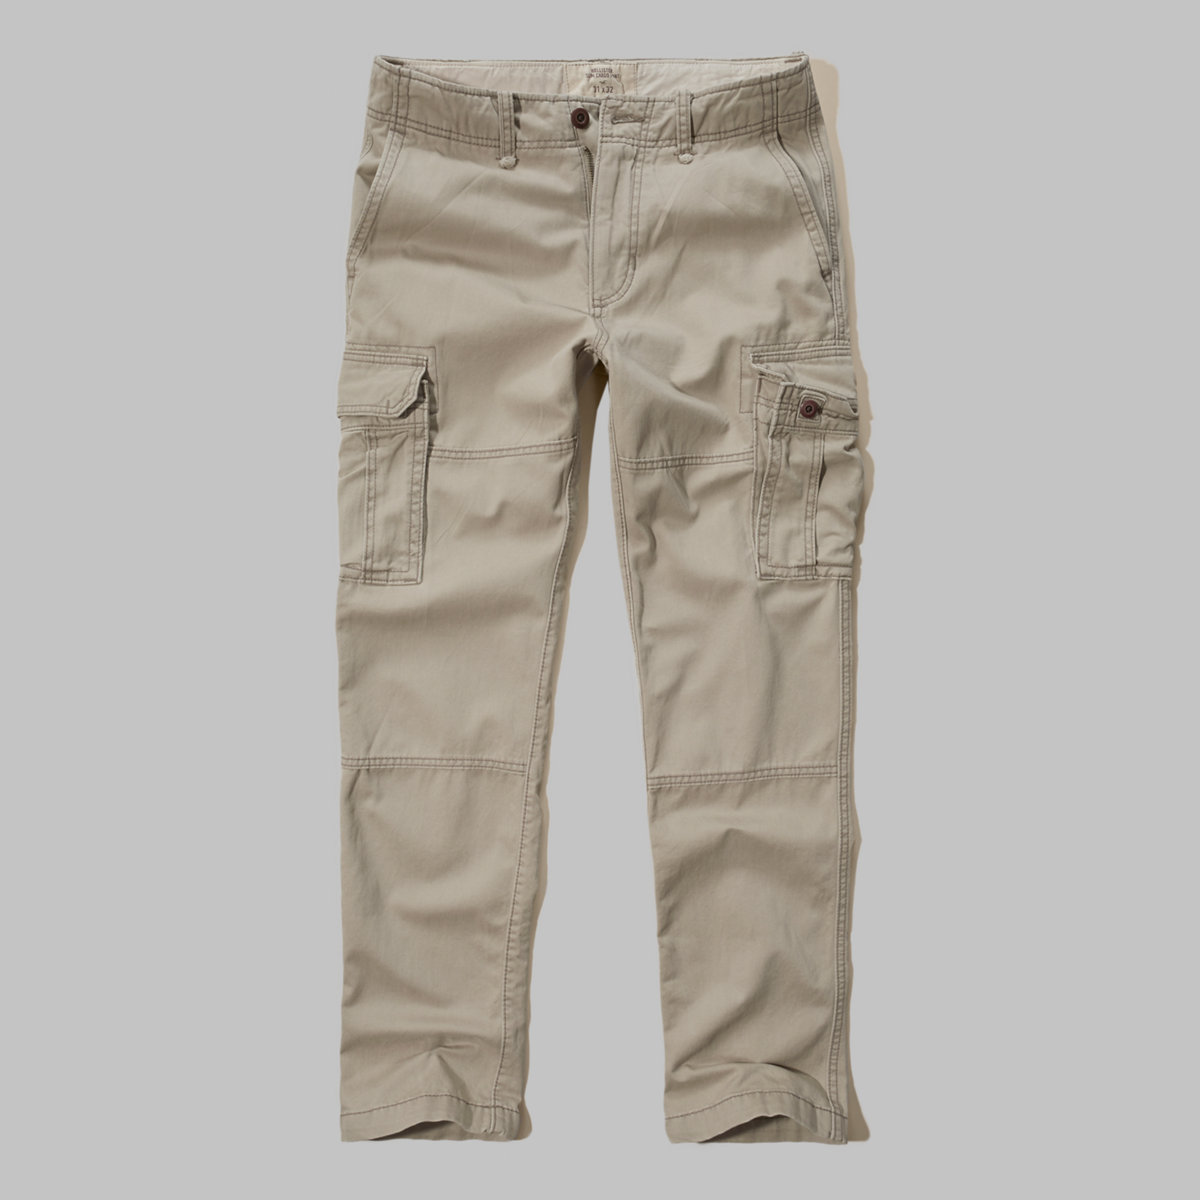 Hollister Slim Straight Cargo Pants